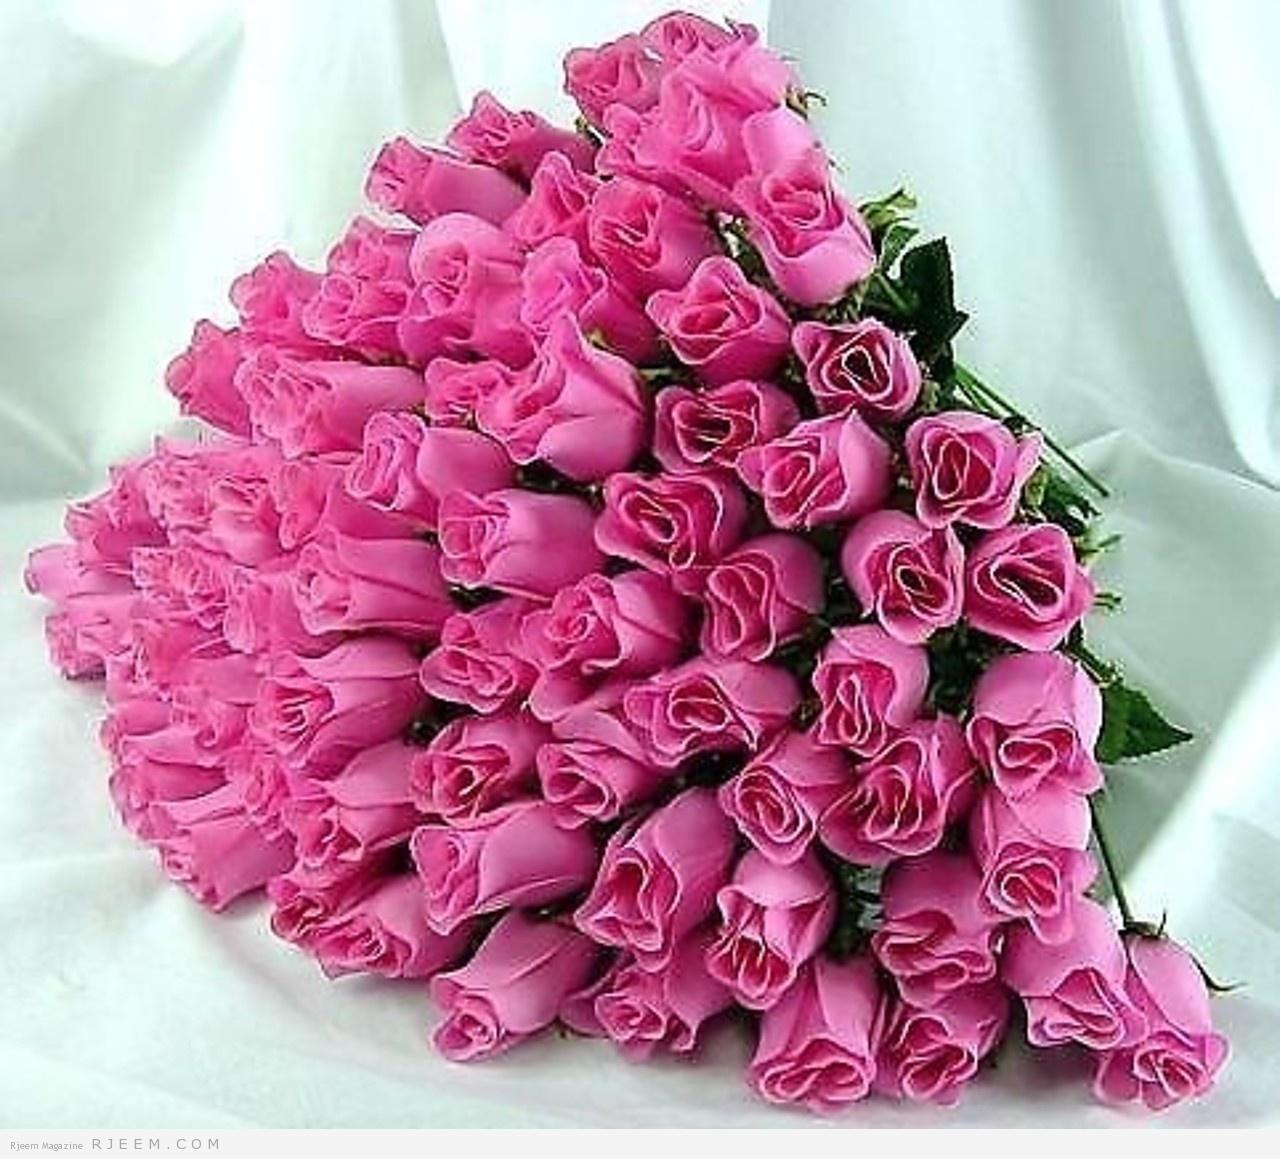 بالصور باقات زهور , اجمل الورد خاطفه للعيون 1178